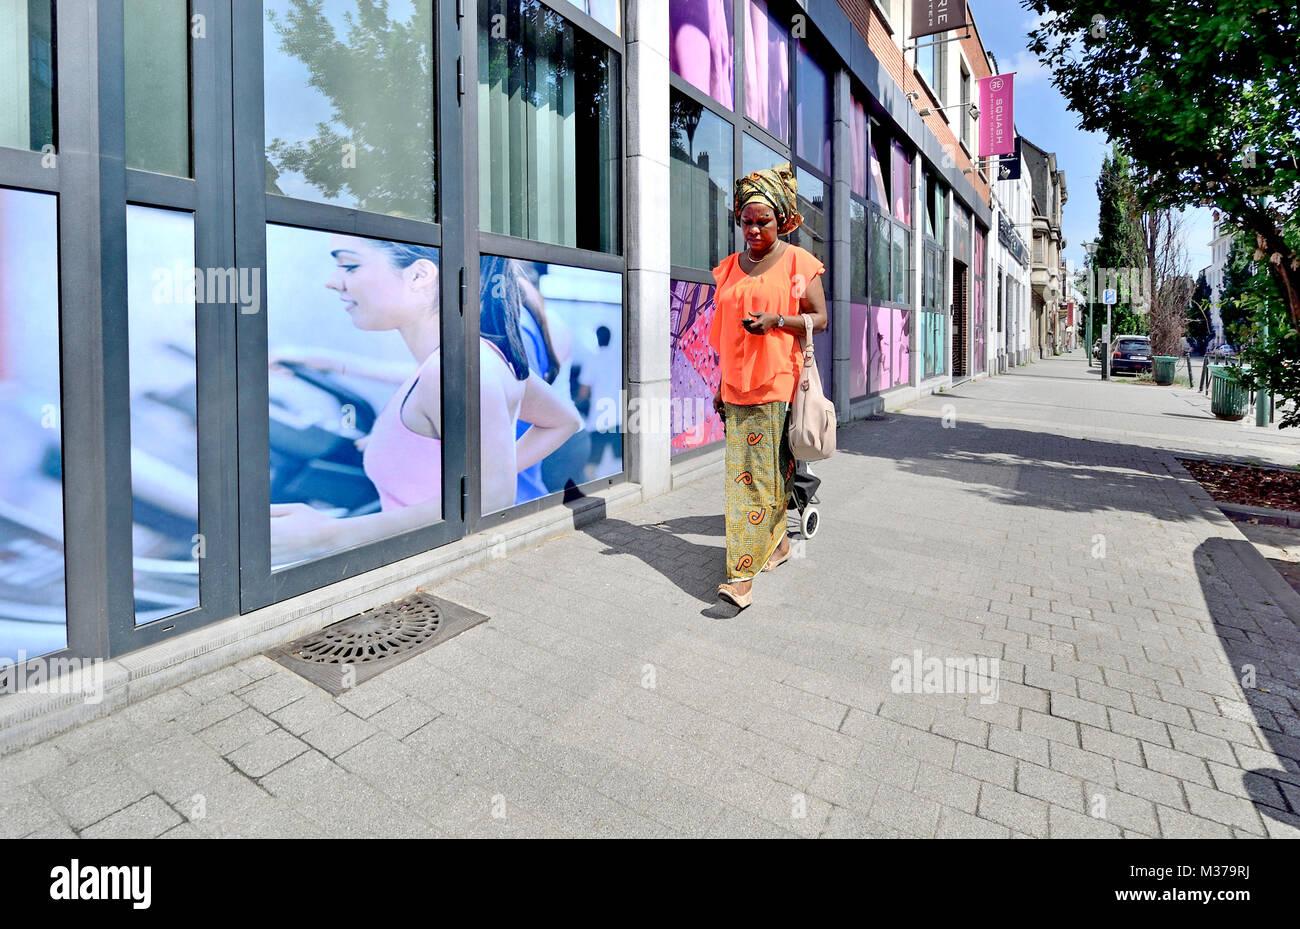 Bruxelles, Belgique. African woman walking in the street Photo Stock